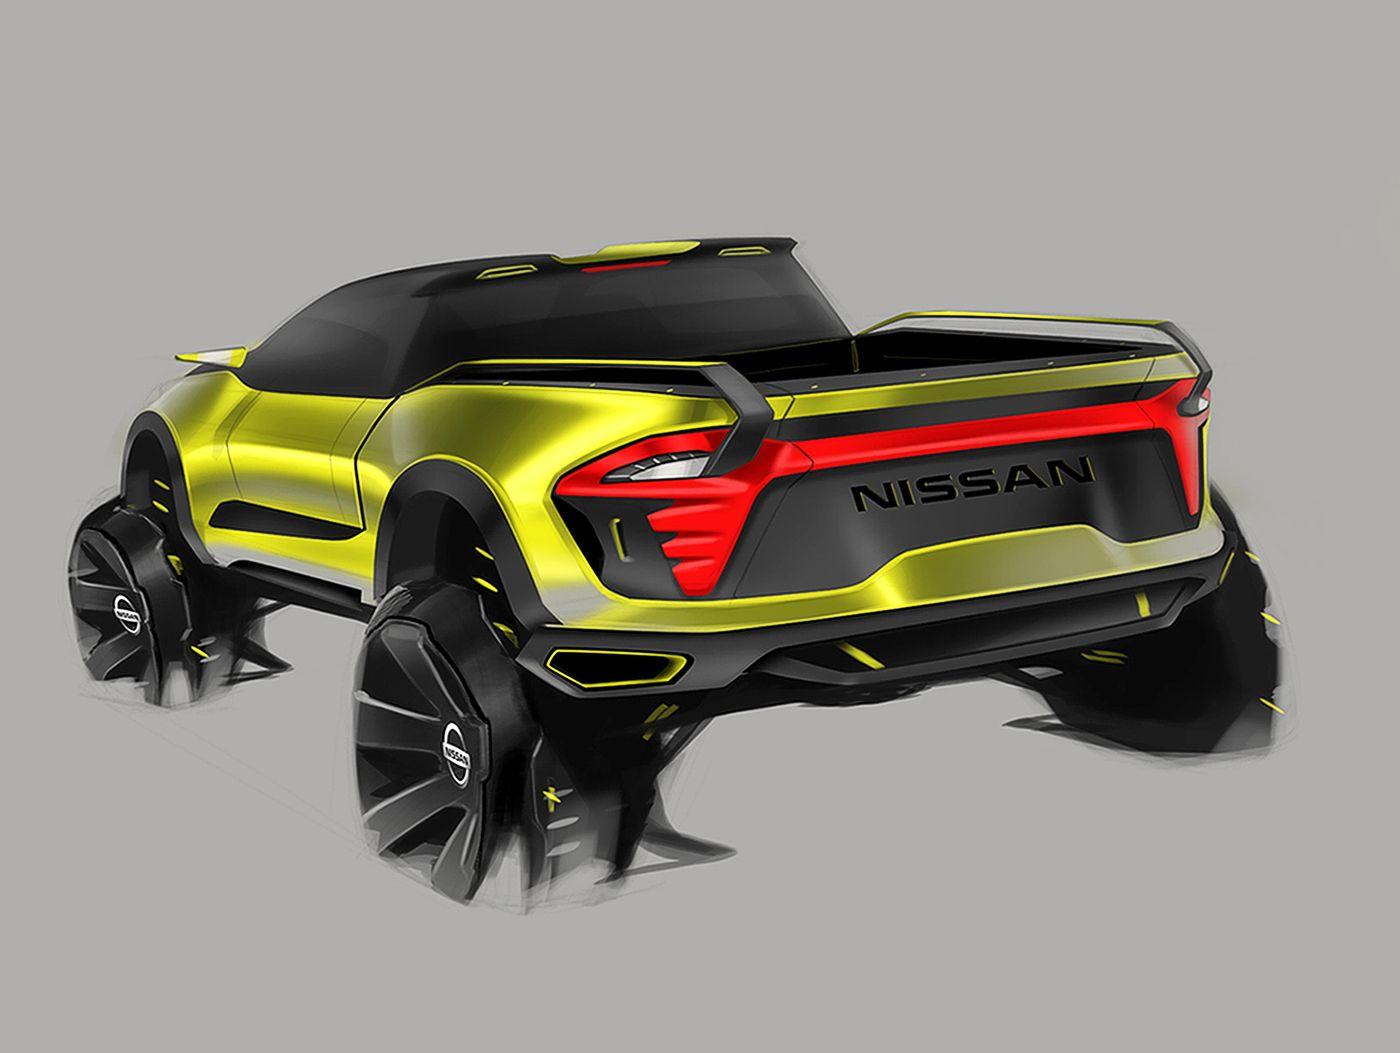 Enjoy Projects Compilation By Randy Hjelm Automotive Designer From College For Creative Studies Detroit Concept Car Design Concept Car Sketch Futuristic Cars